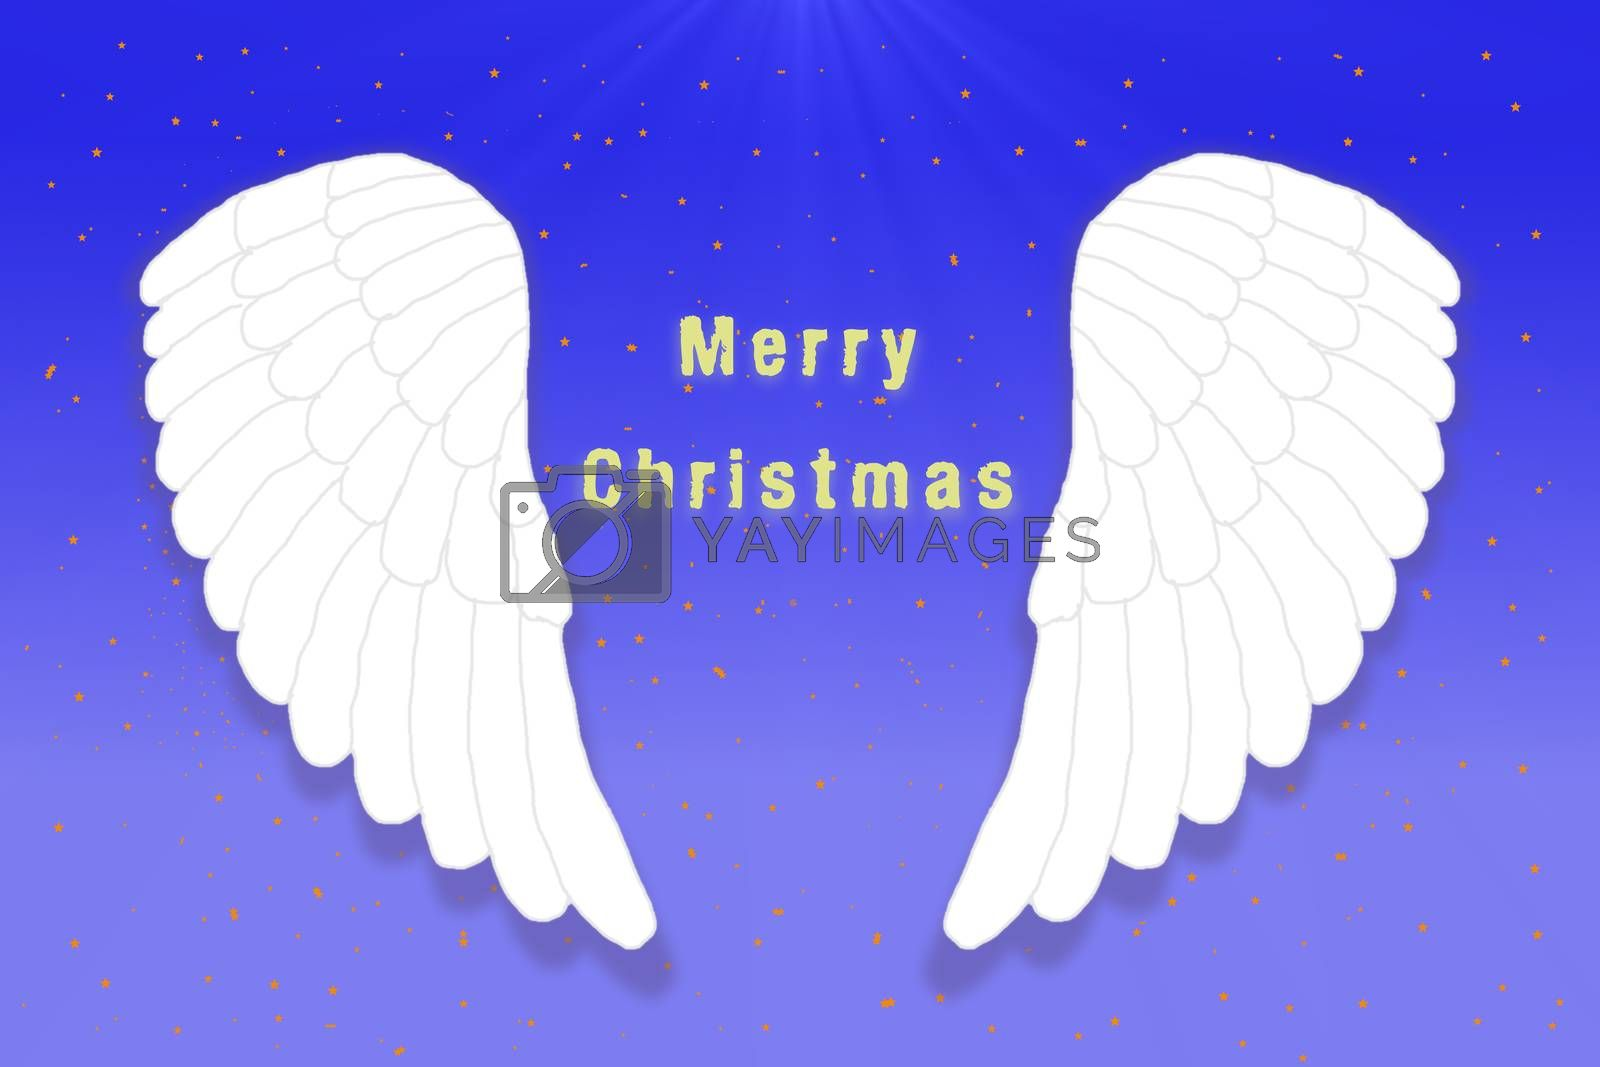 Illustration: Merry Christmas